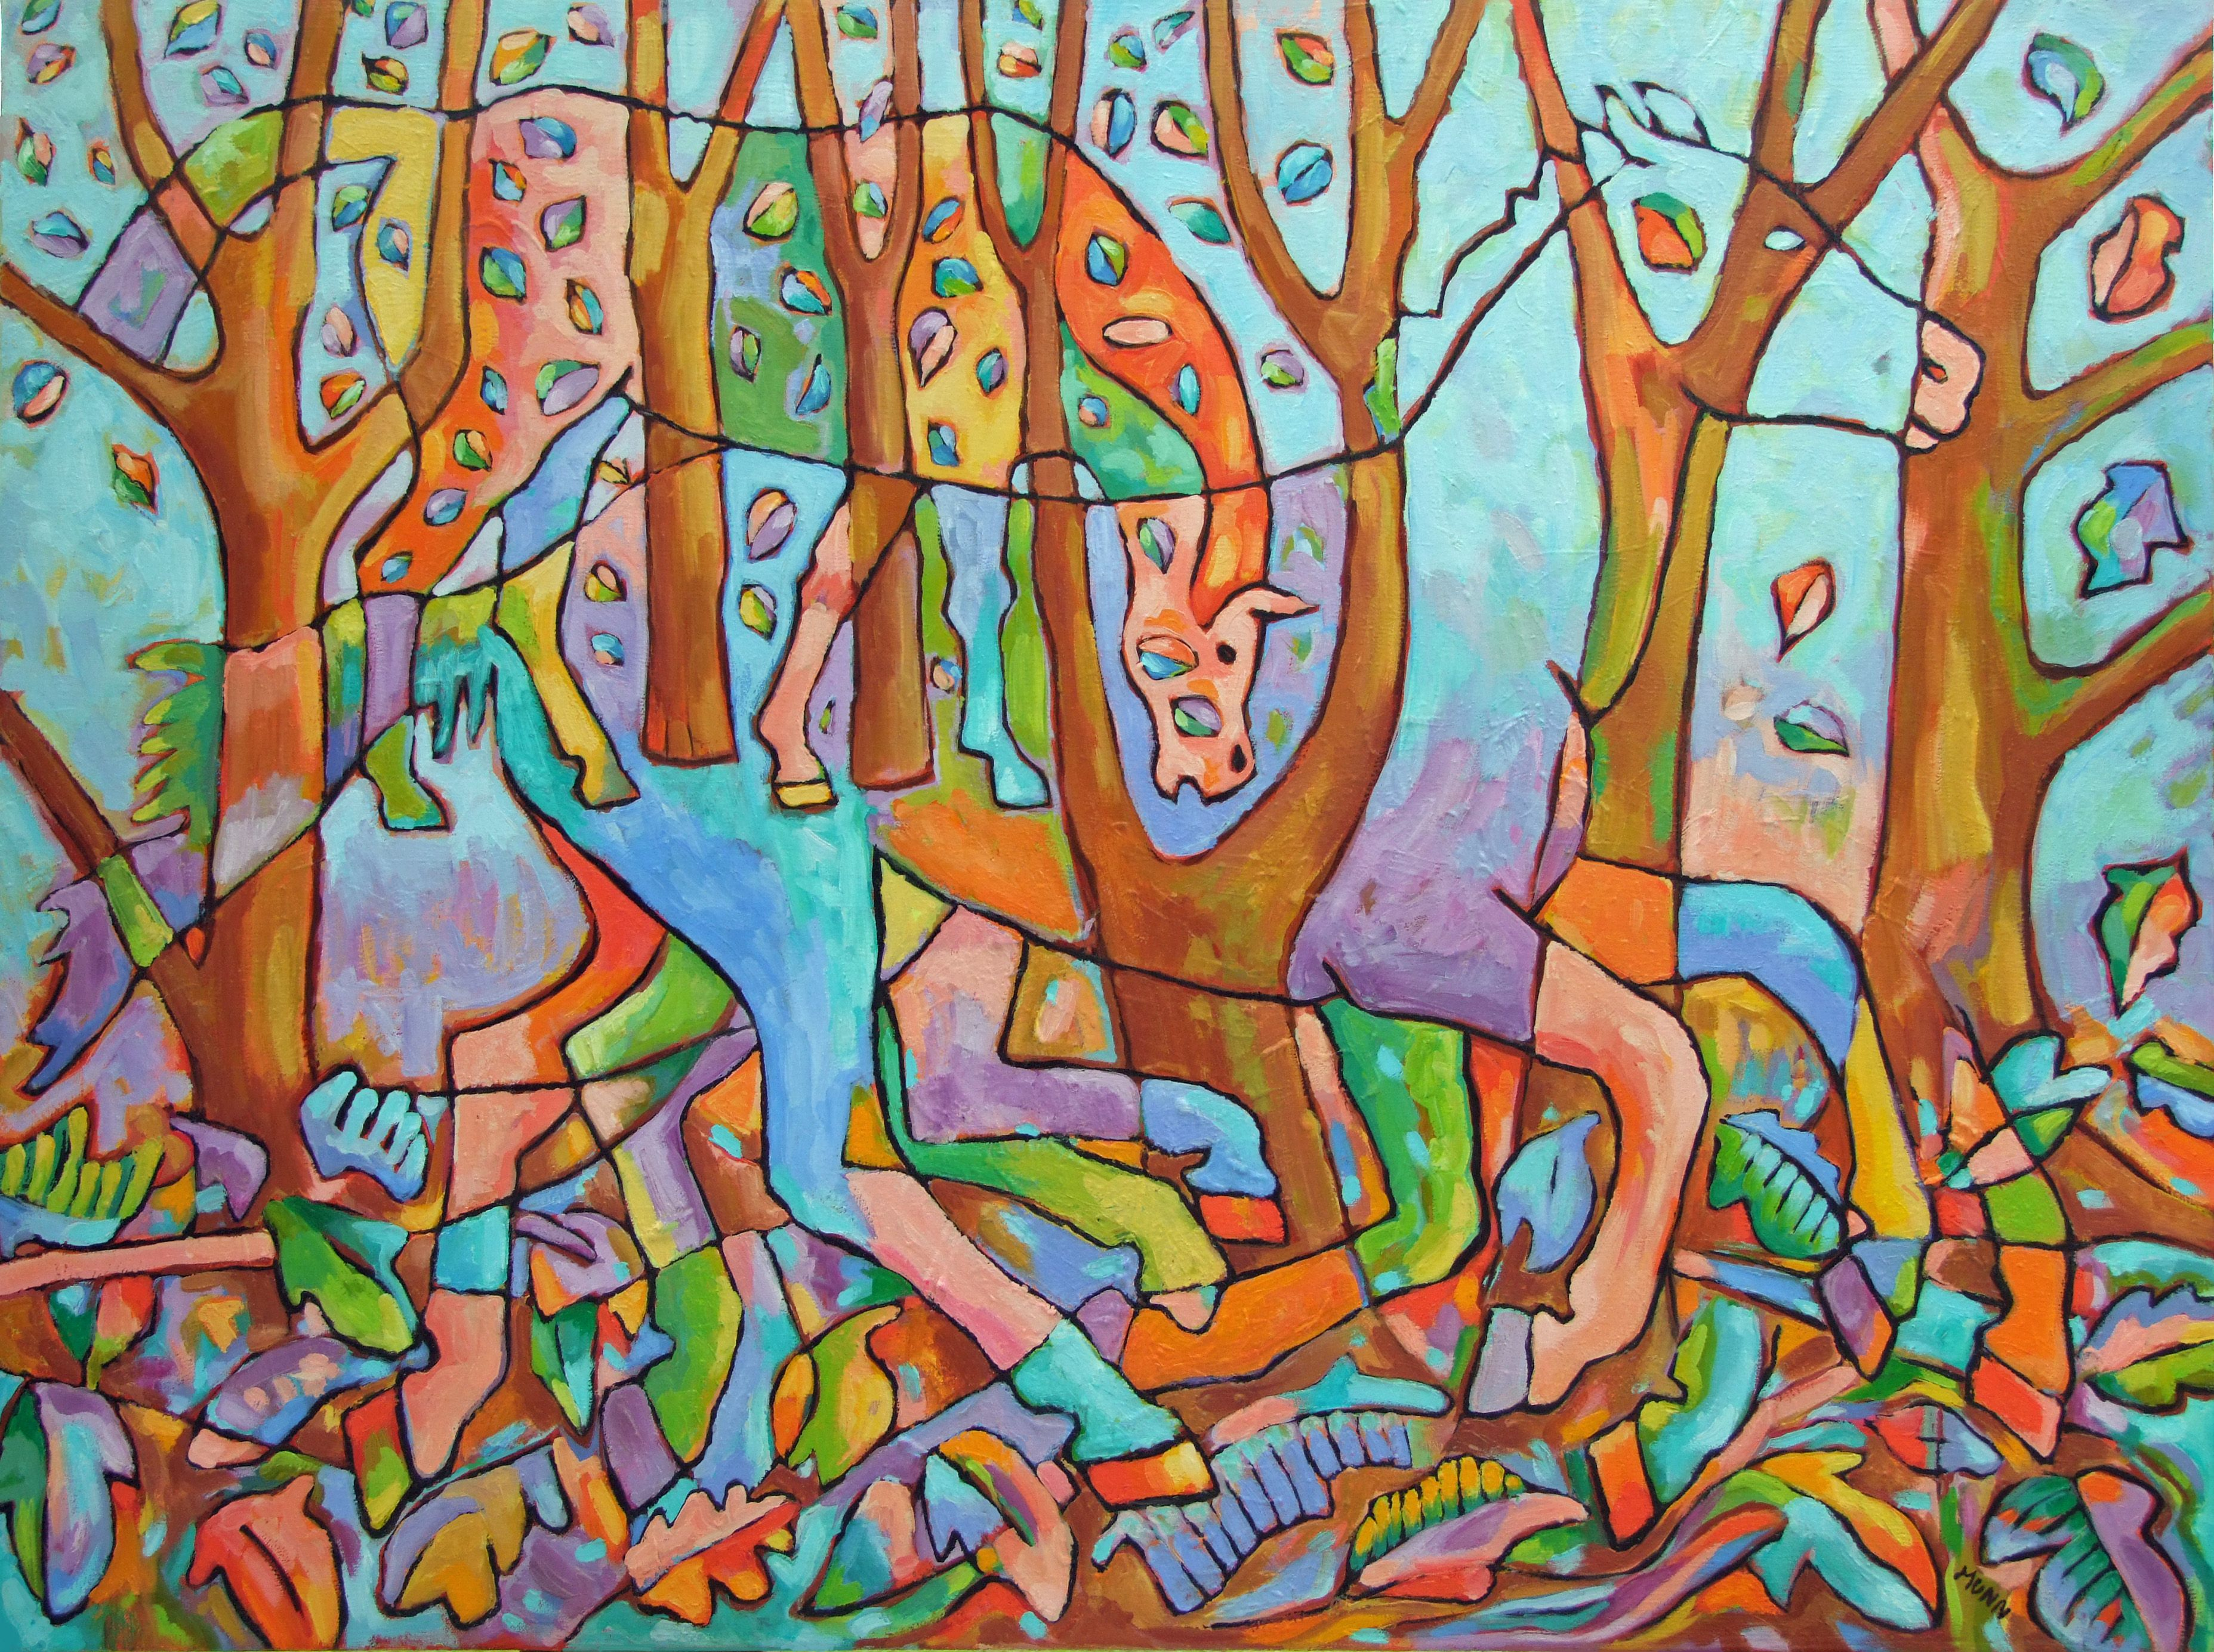 Margaret Munn | ART - Intro | Principles of art, Unity in